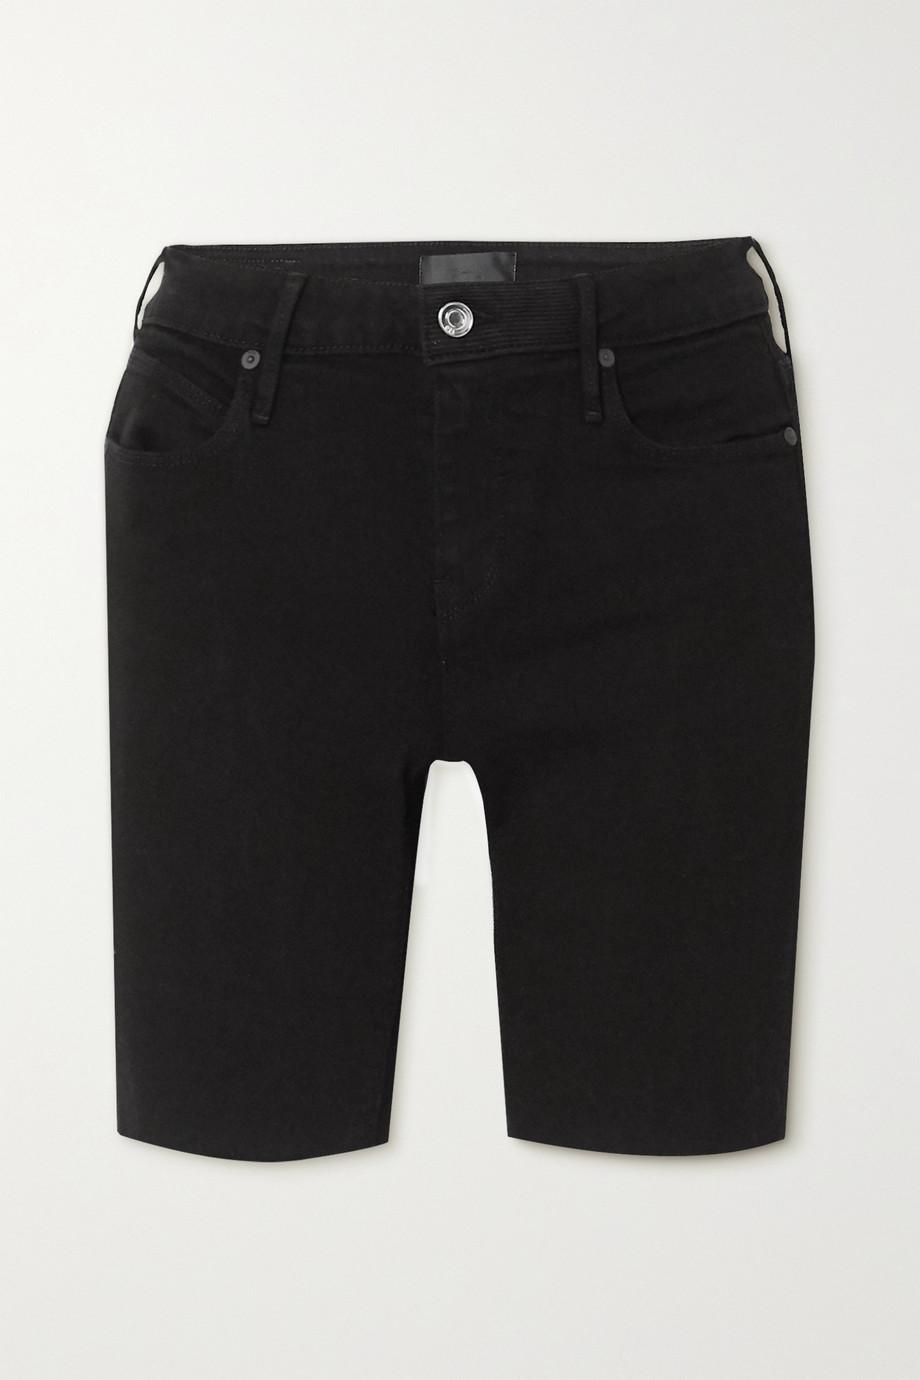 RtA Toure denim shorts